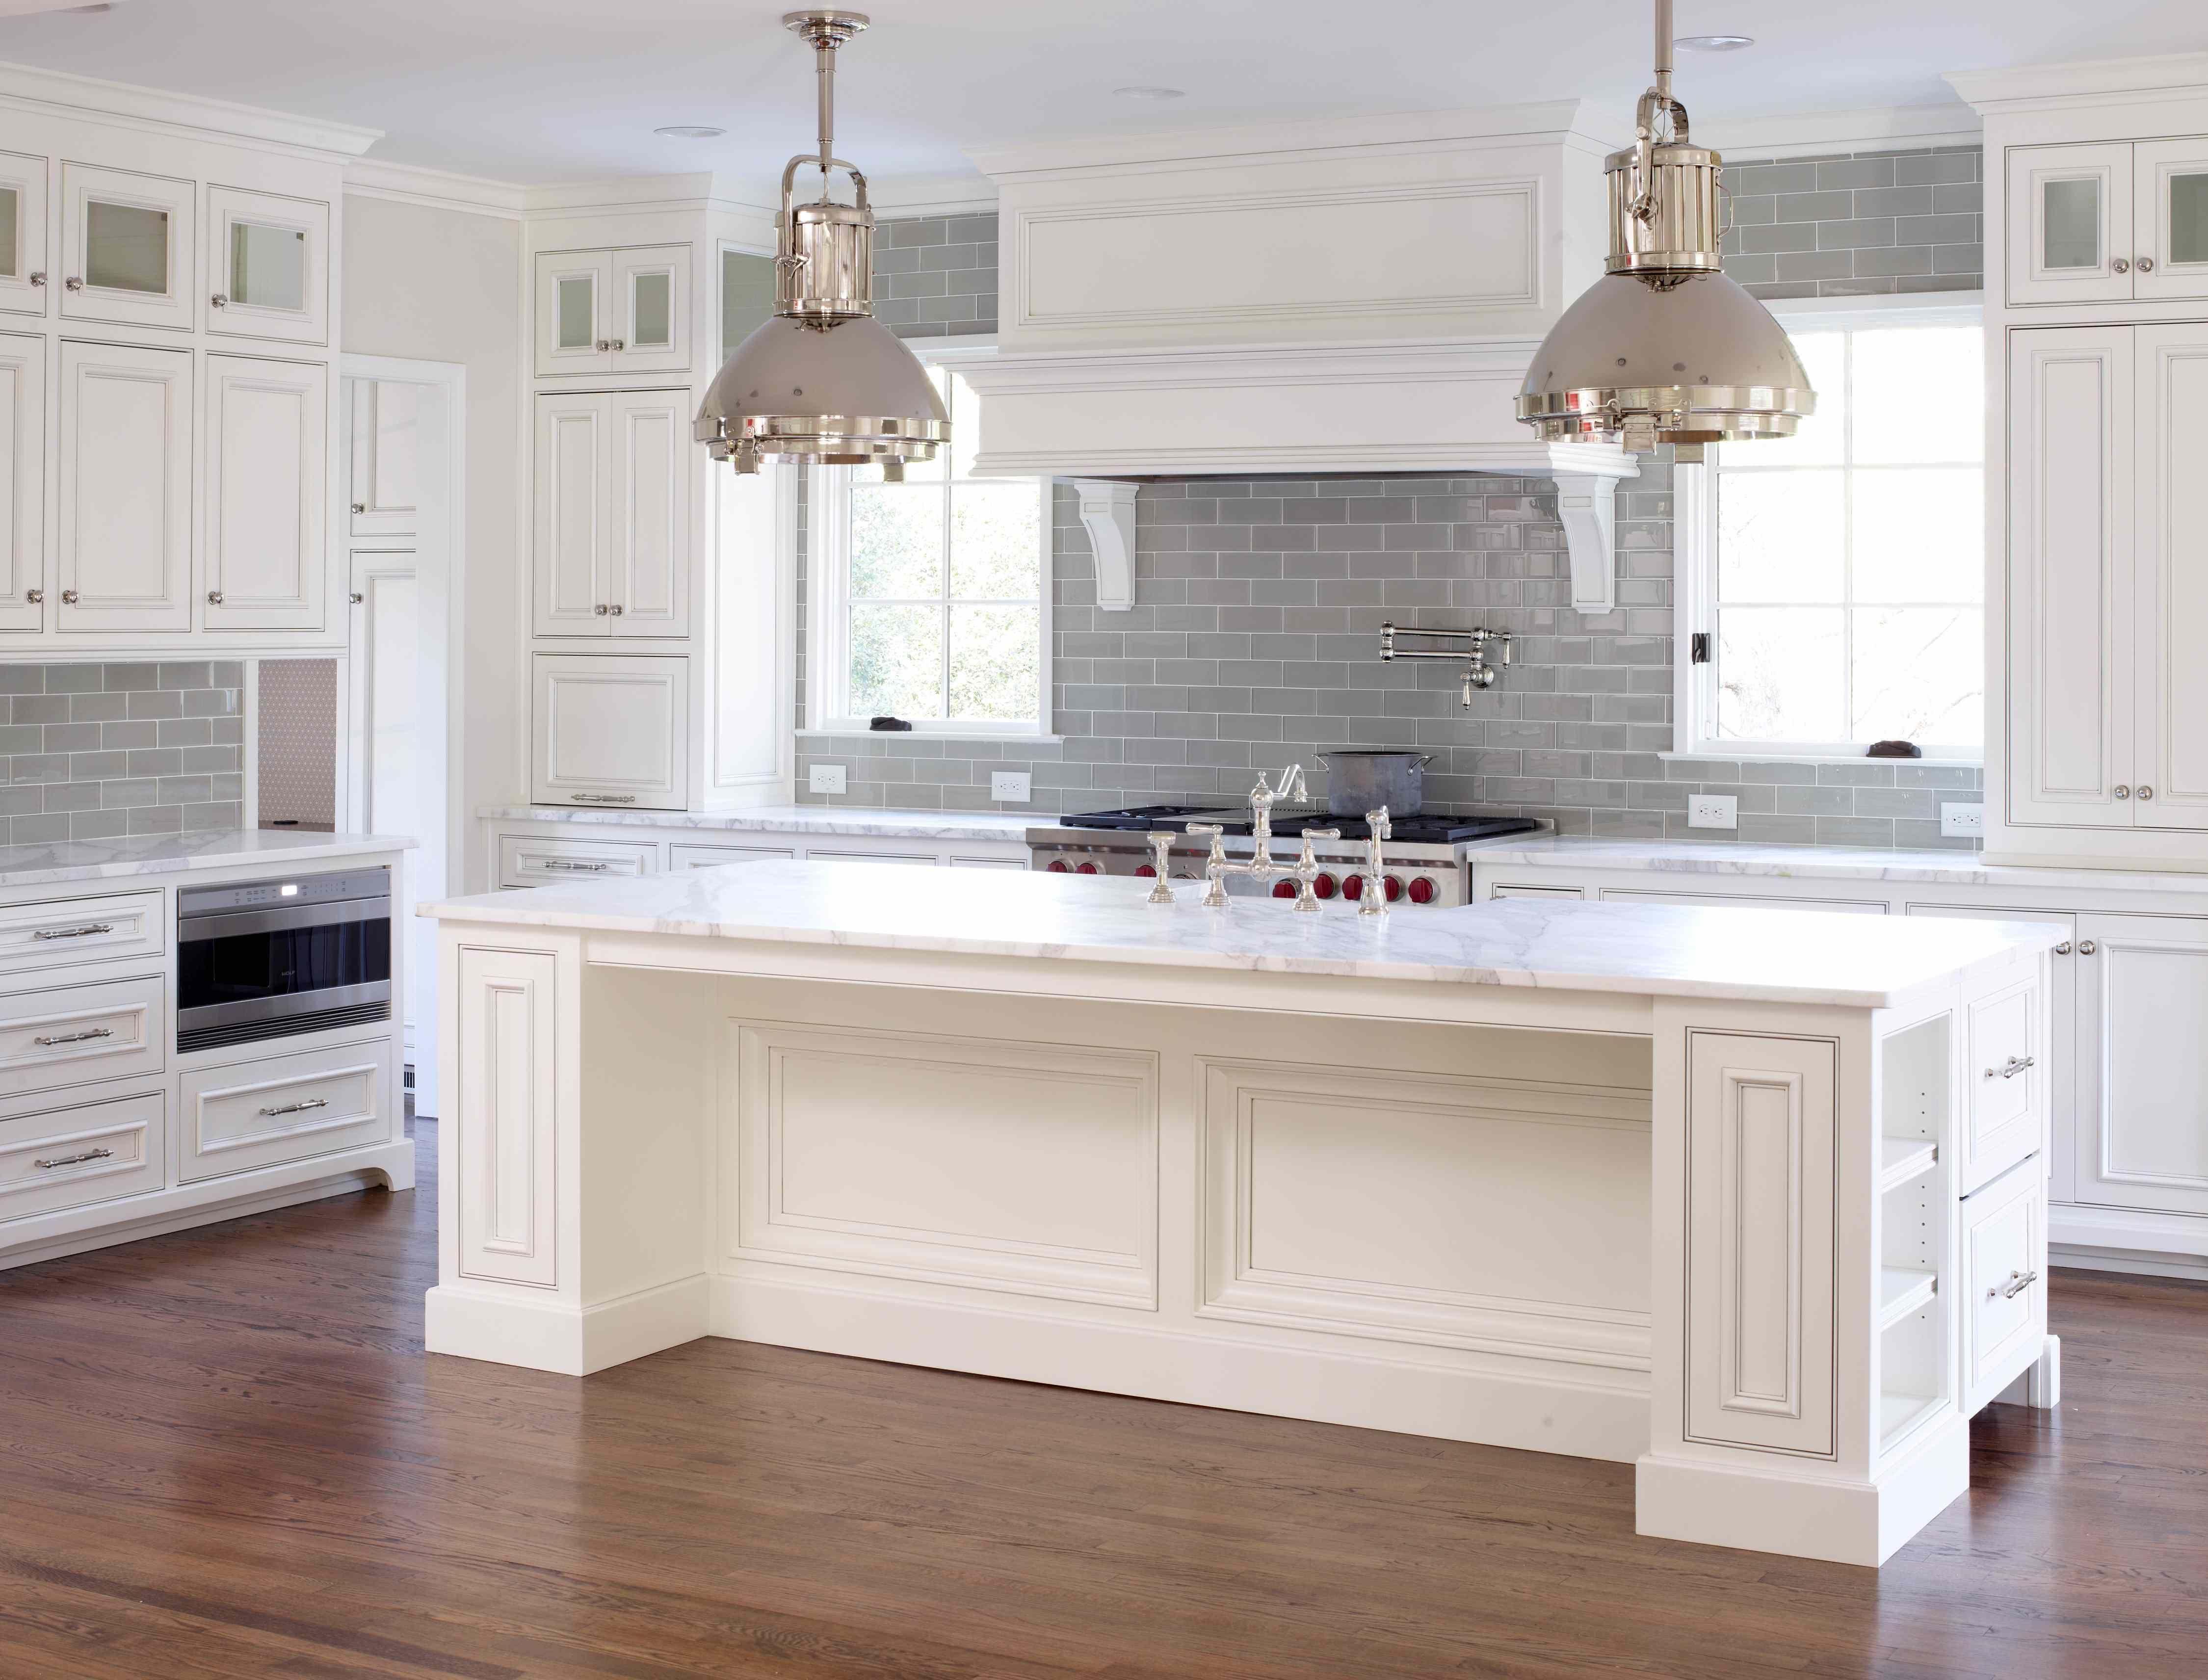 Glass Tile Backsplash Designs Full Cabinet List Porcelain Drawer